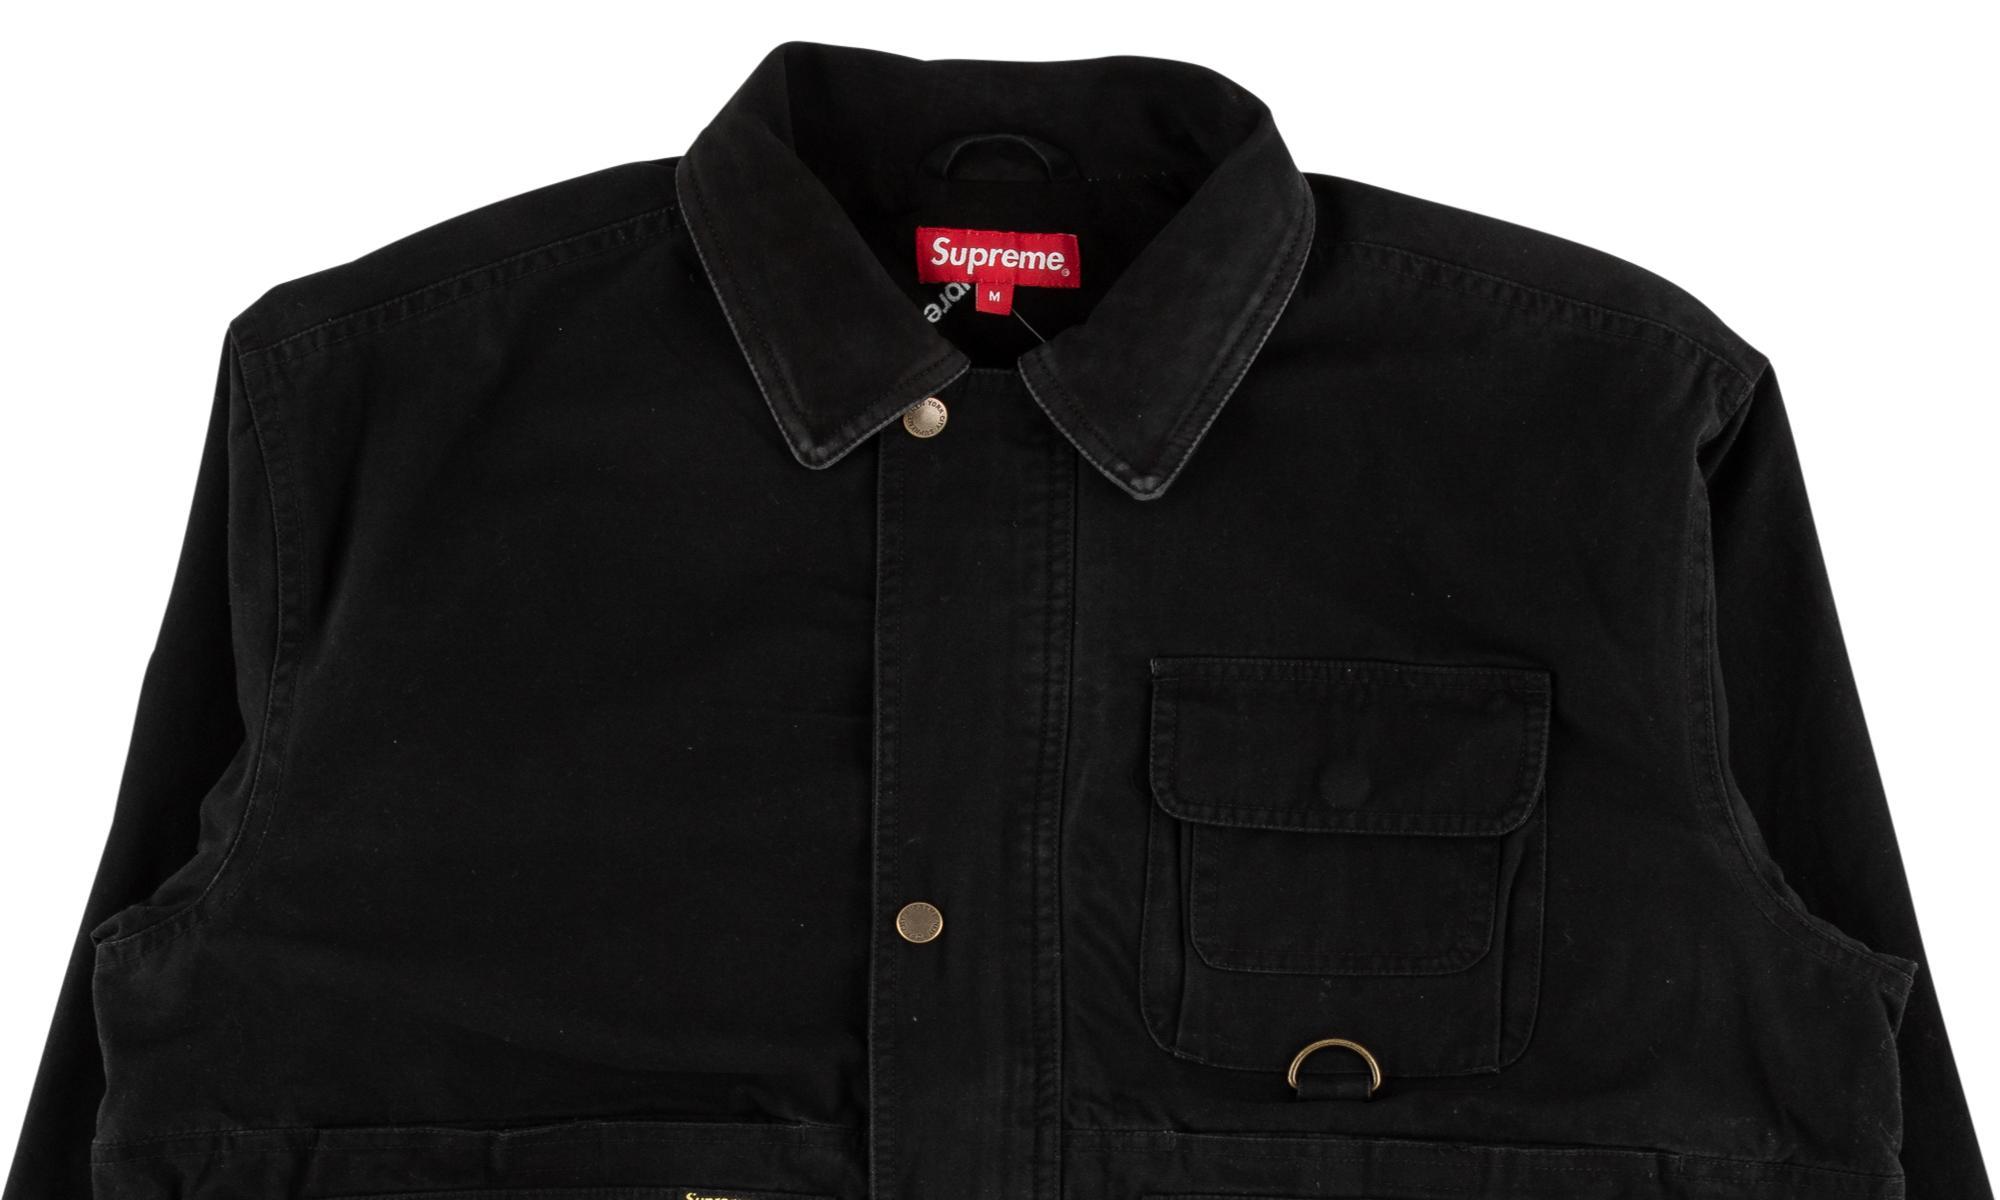 Supreme Field Jacket 'fw 18' In Black For Men - Lyst